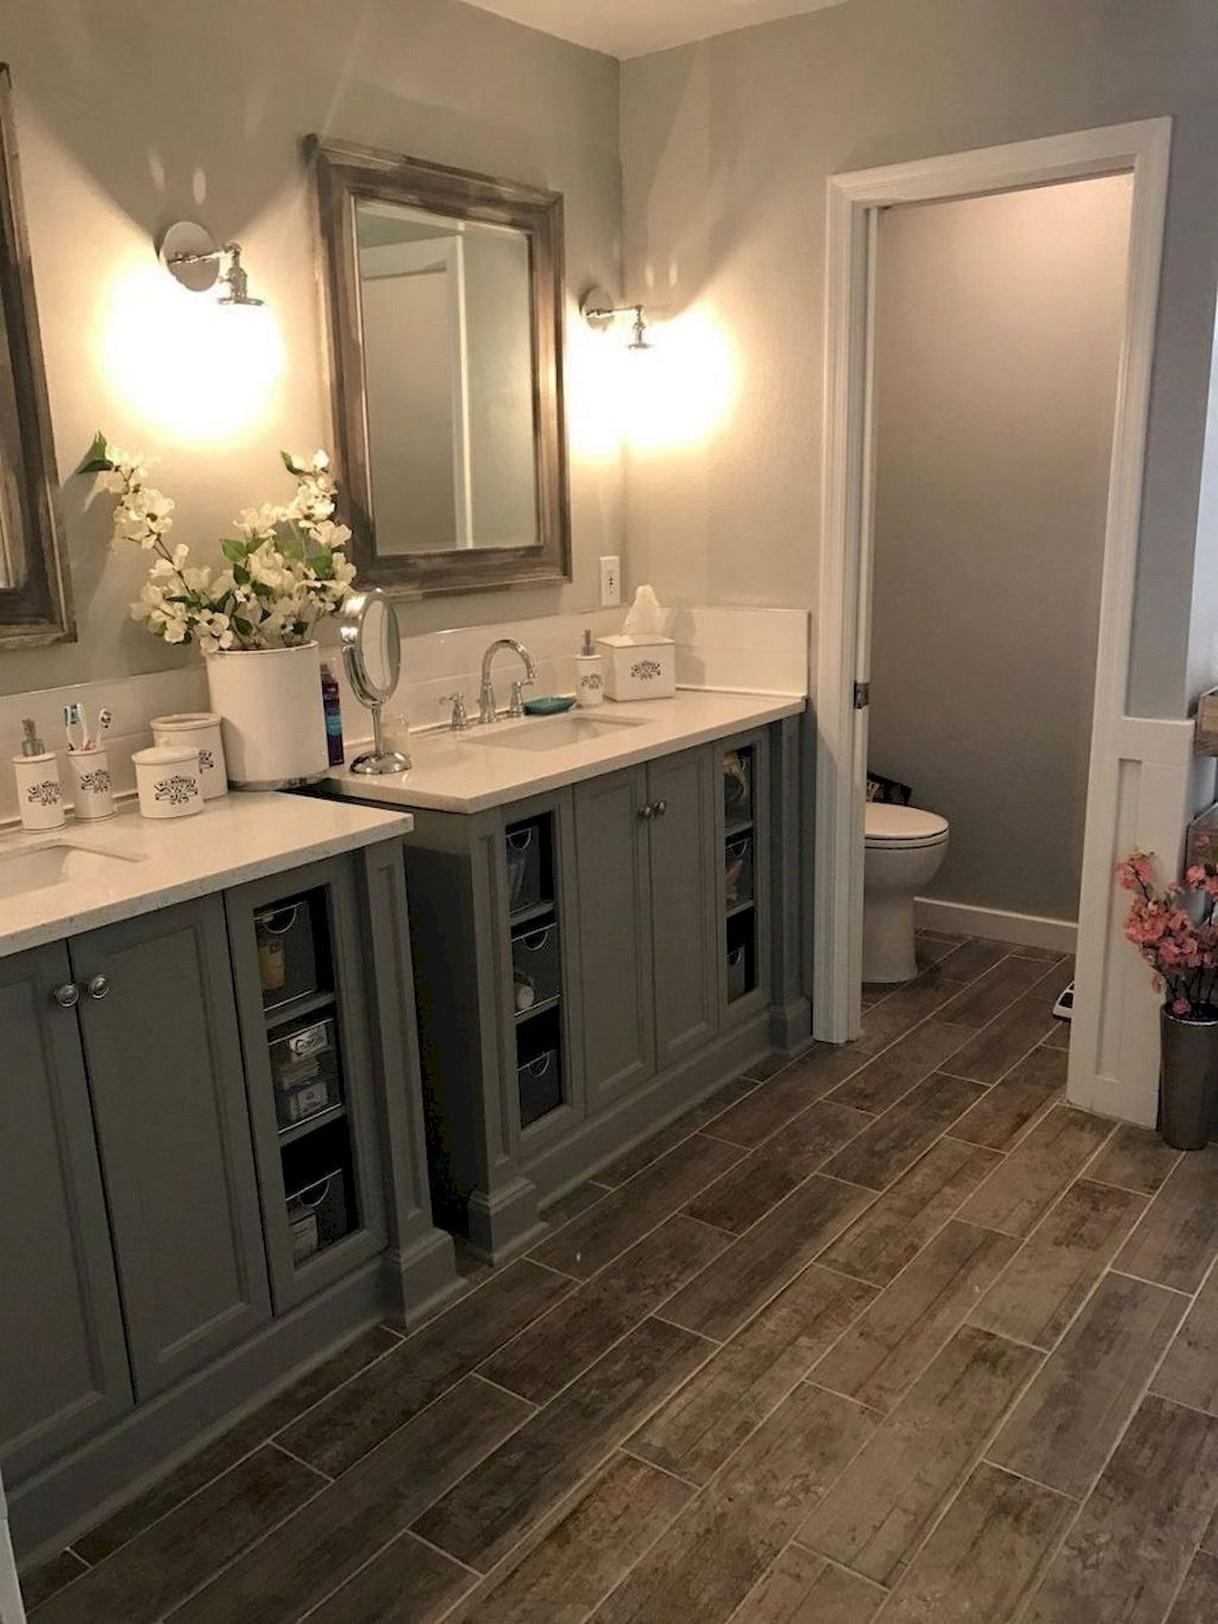 83 Modern Bathroom Design Some Tips Home Decor 63